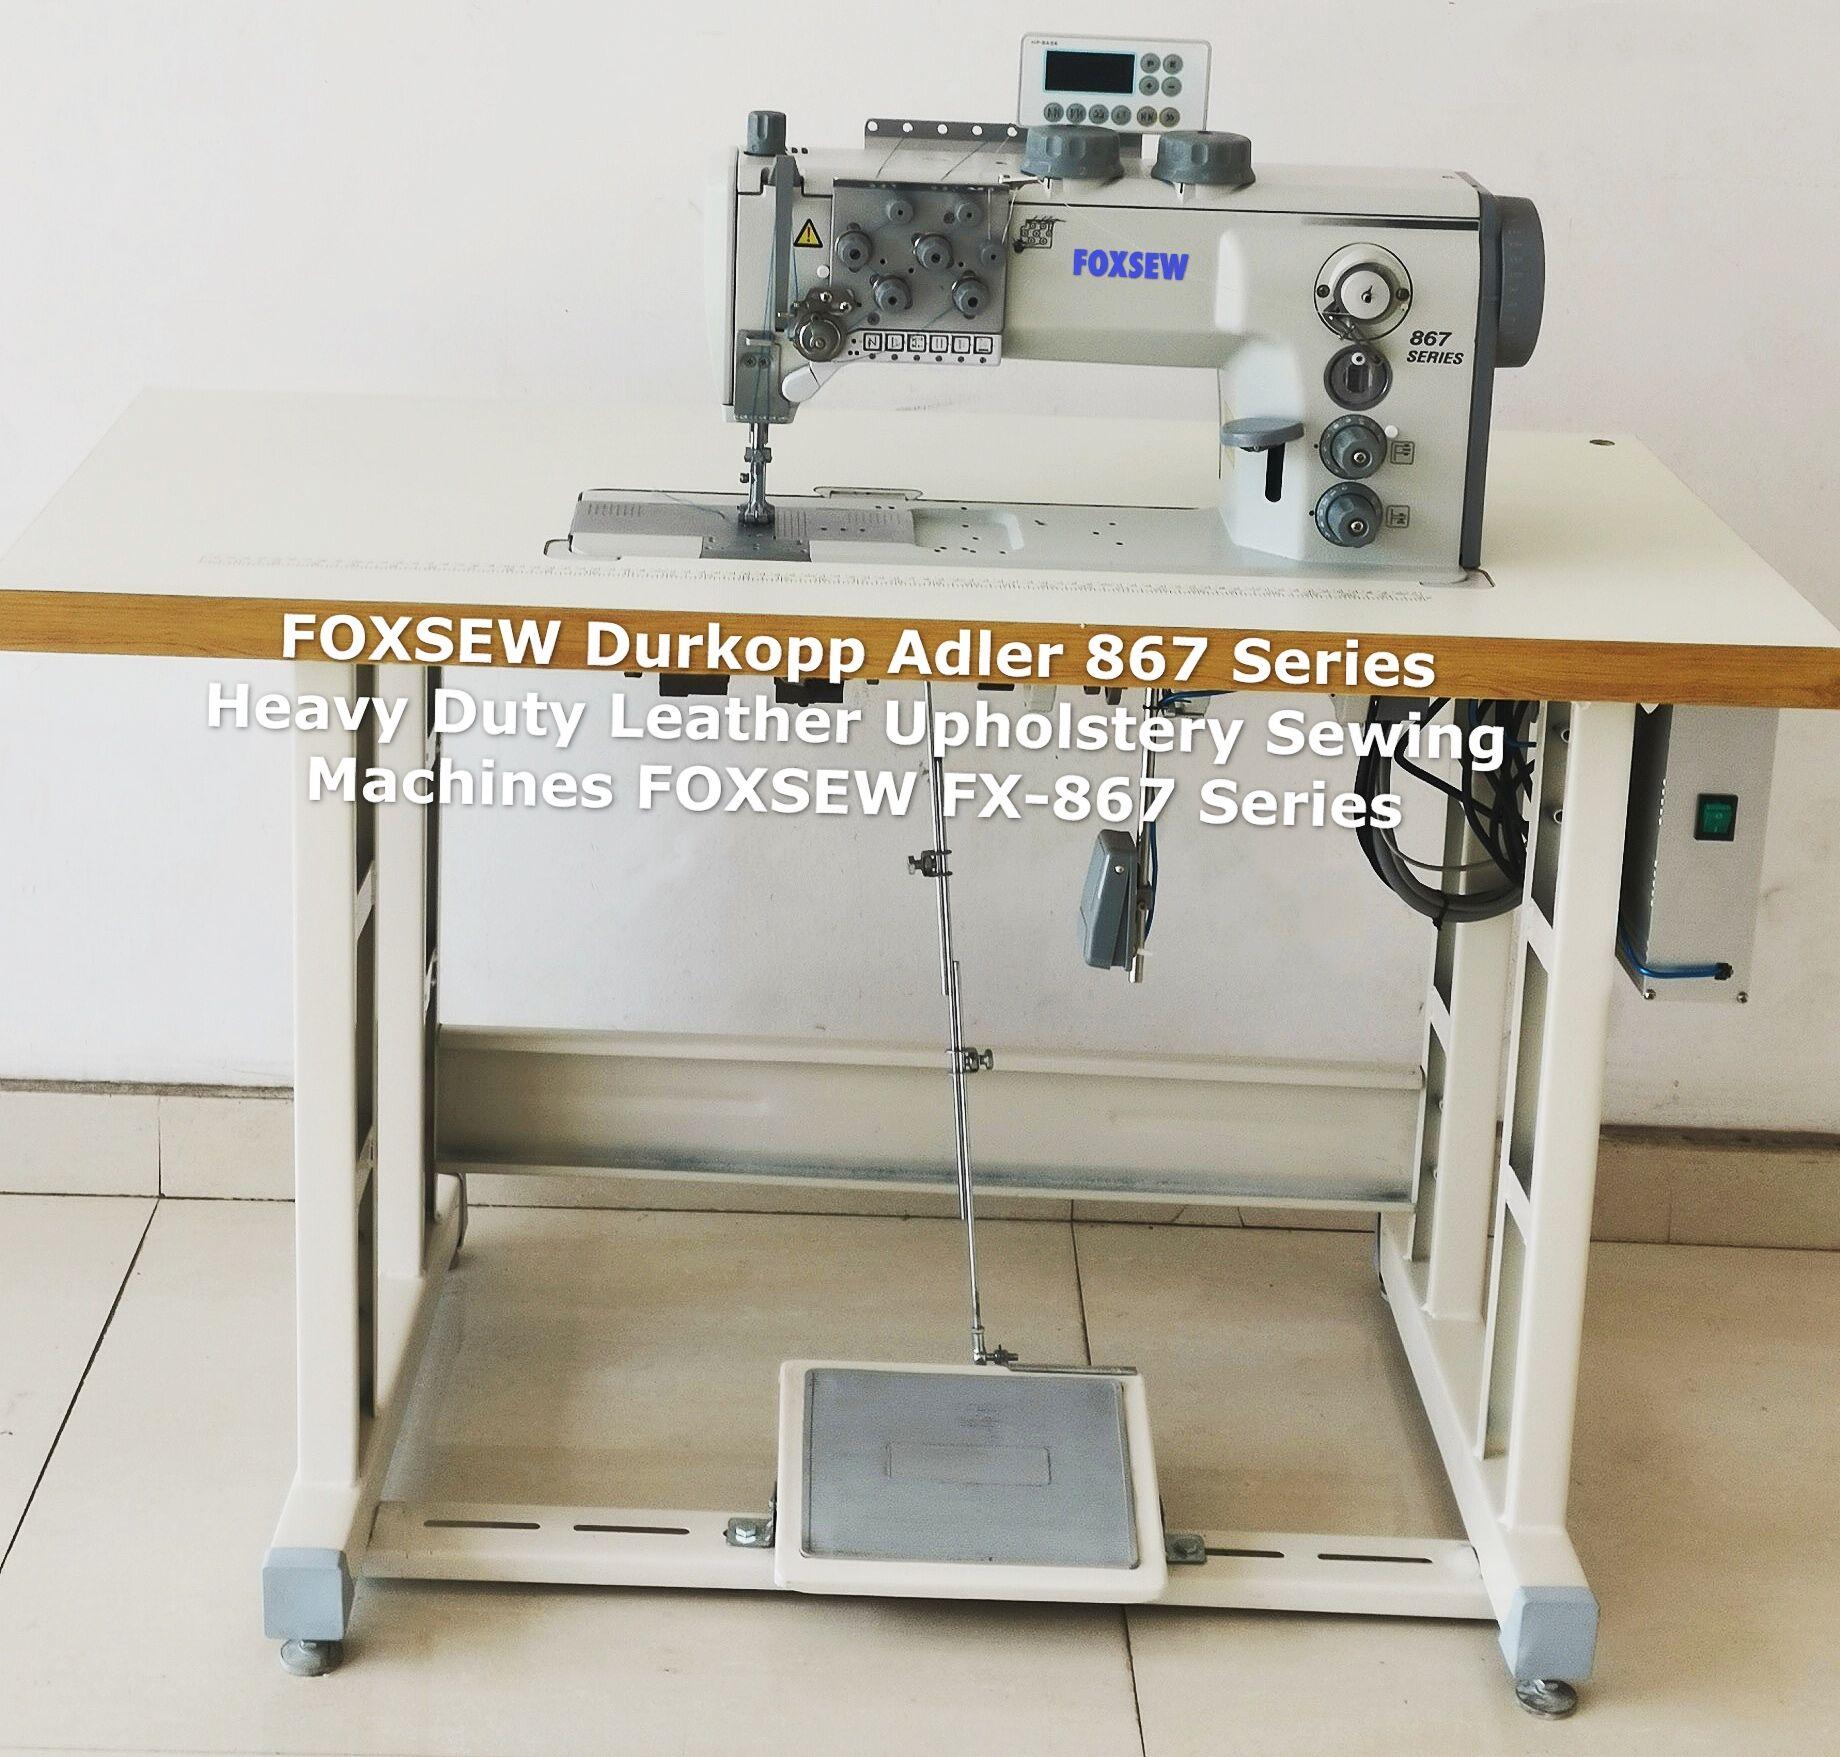 FOXSEW FX-867 Series Machine -1